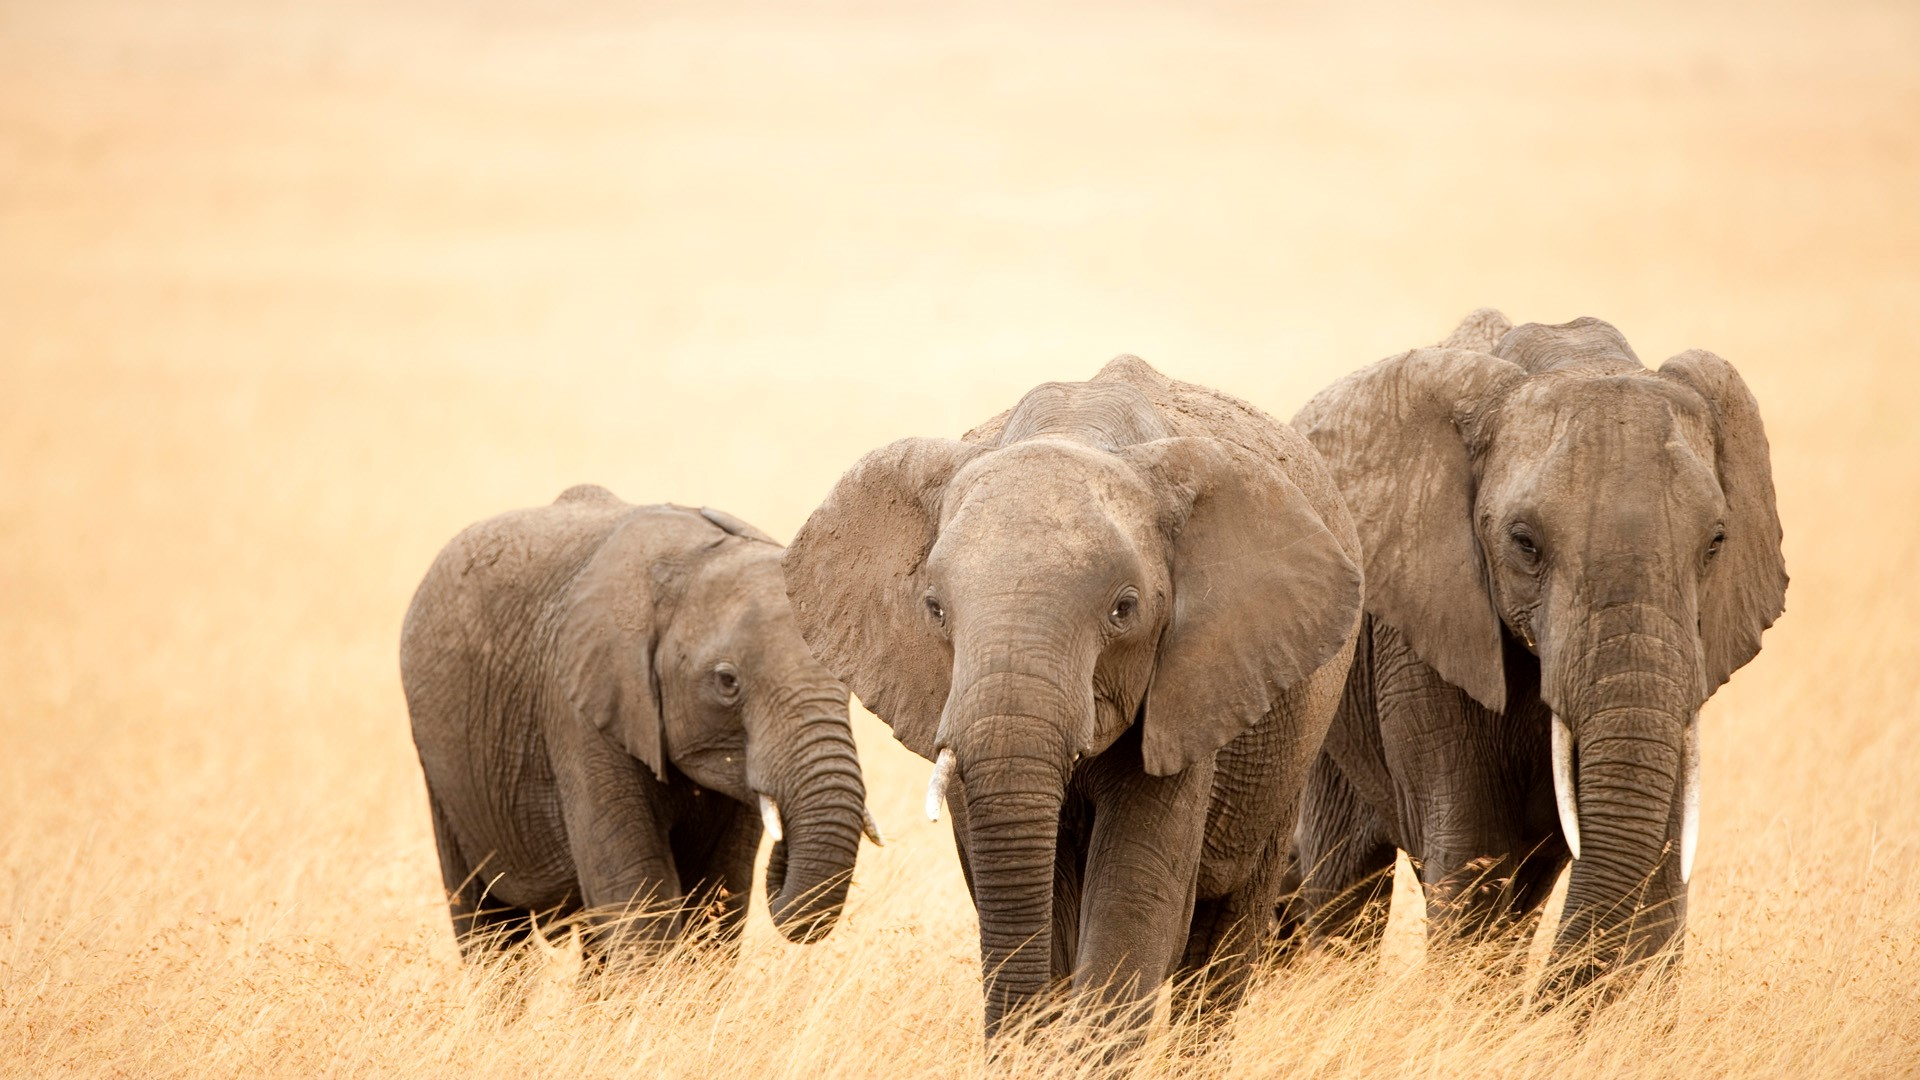 Three elephants photo